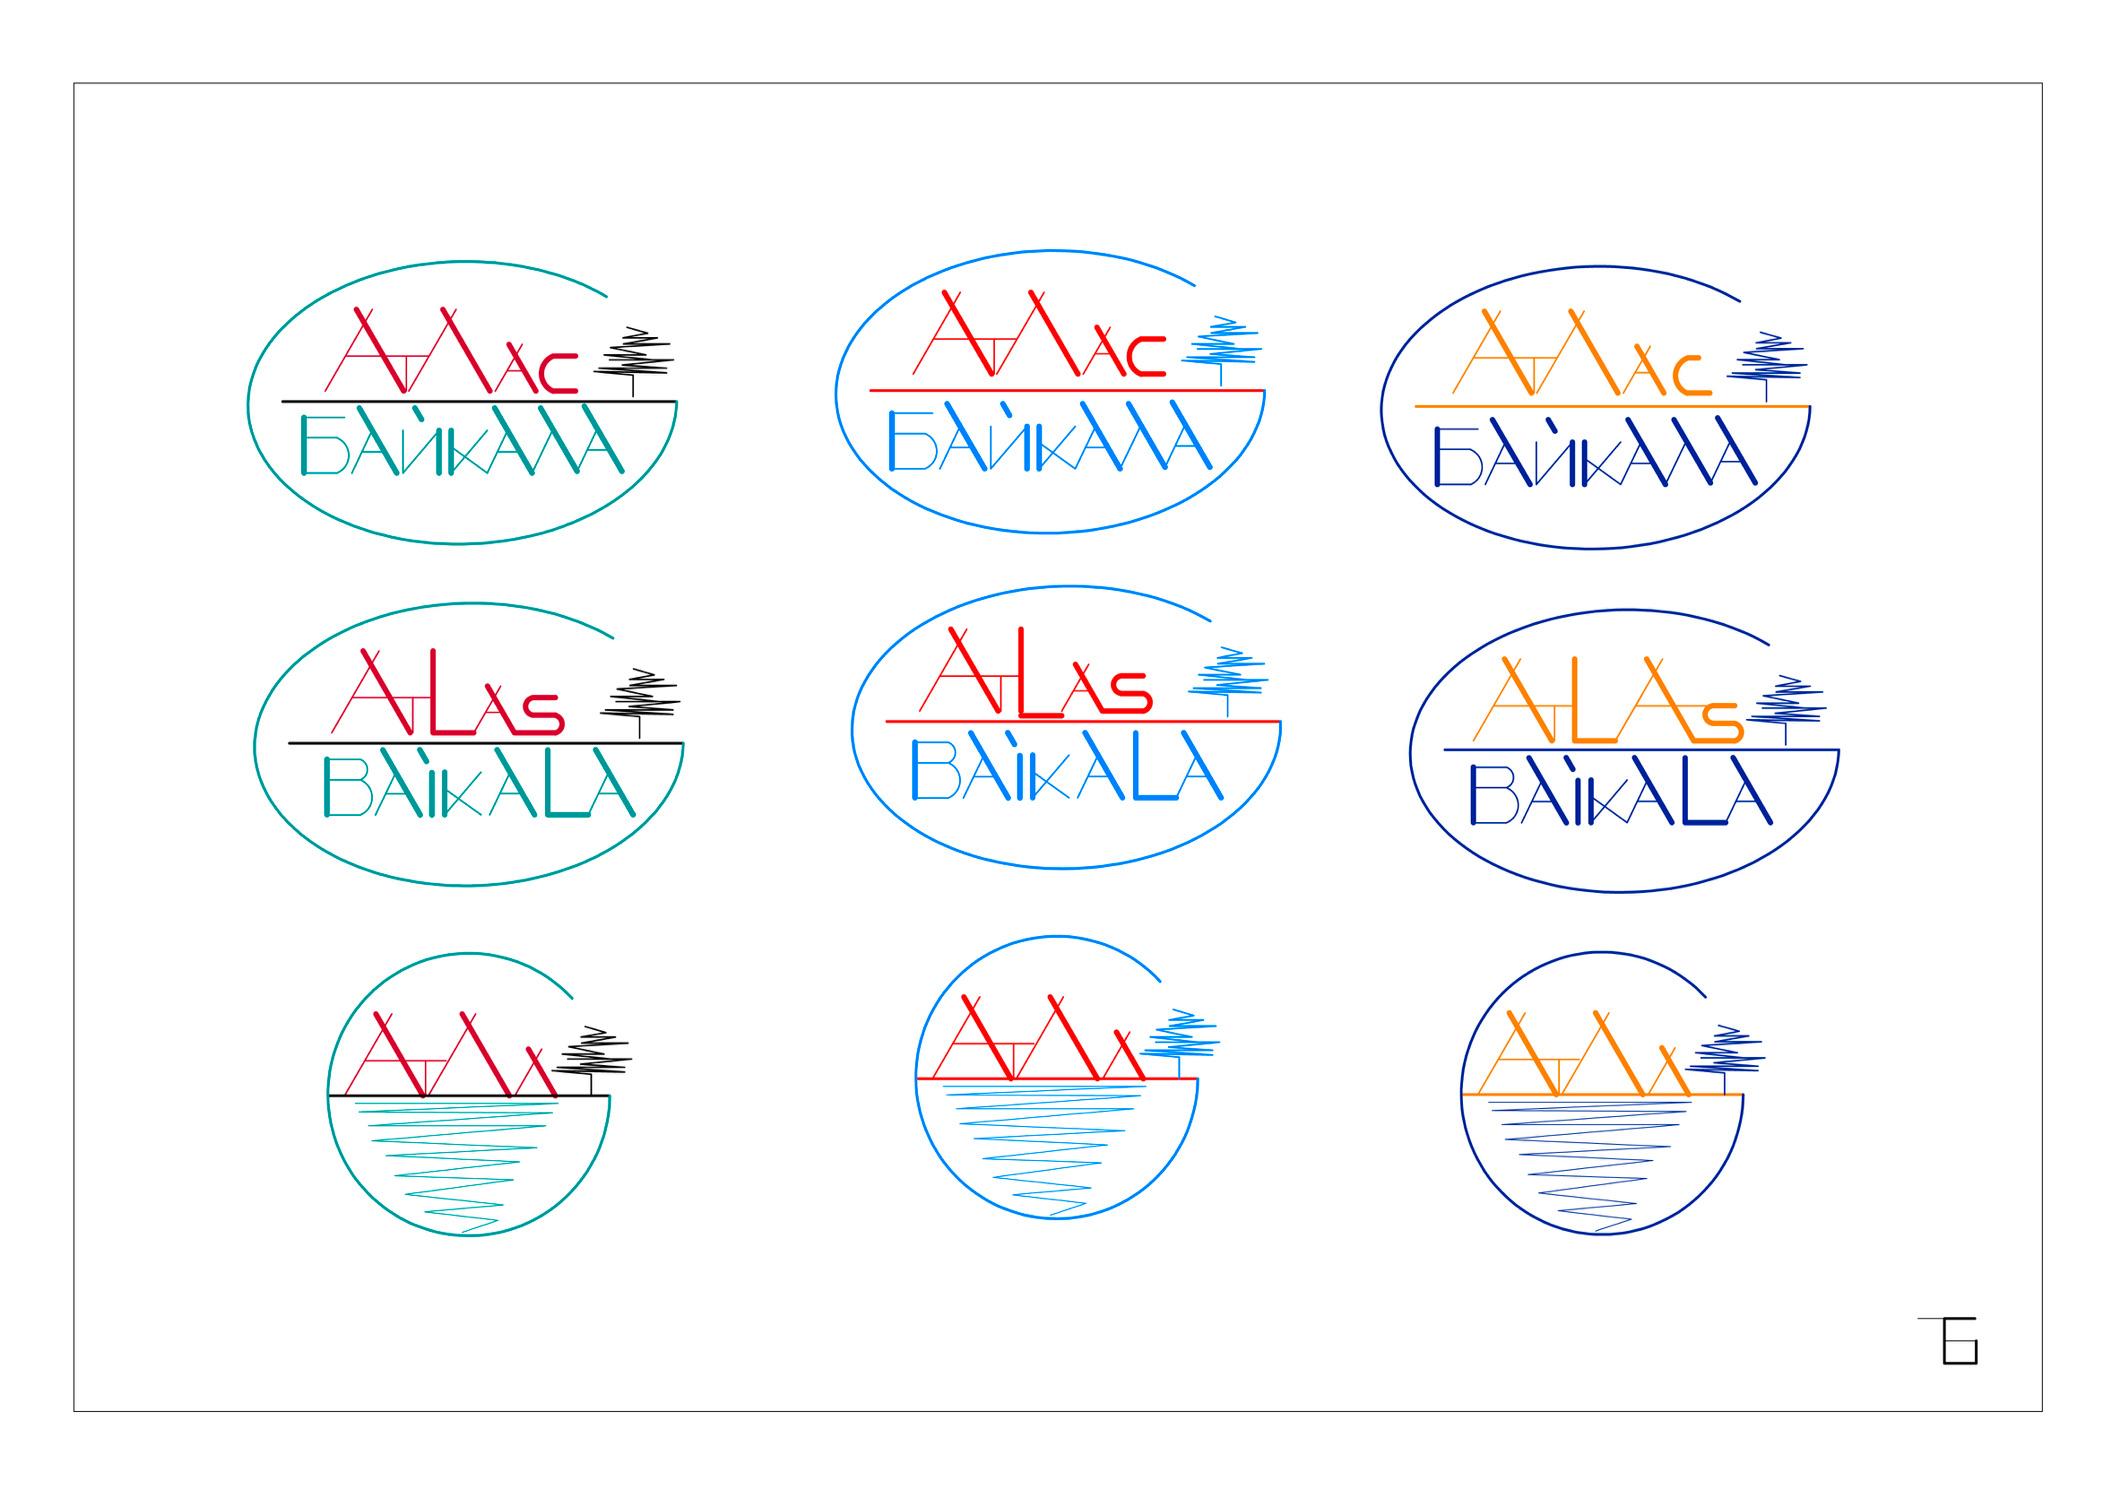 Разработка логотипа Атлас Байкала фото f_3185b050f1e208a5.jpg